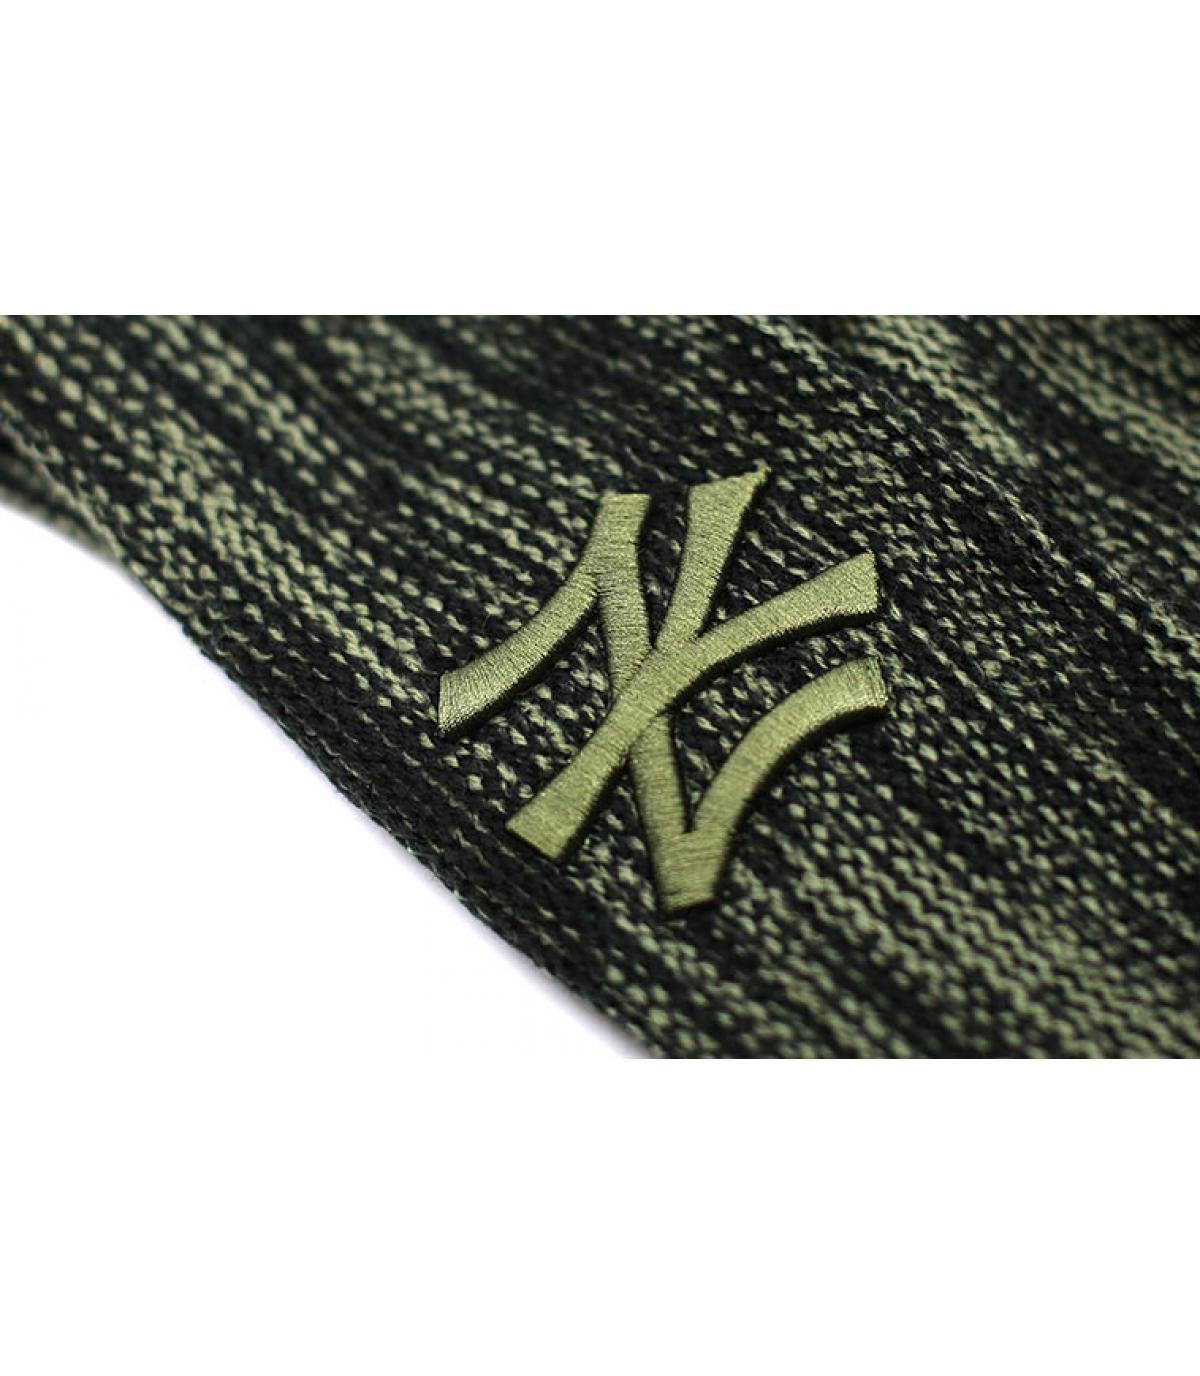 Detalles NY Marl Knit black Olive imagen 3